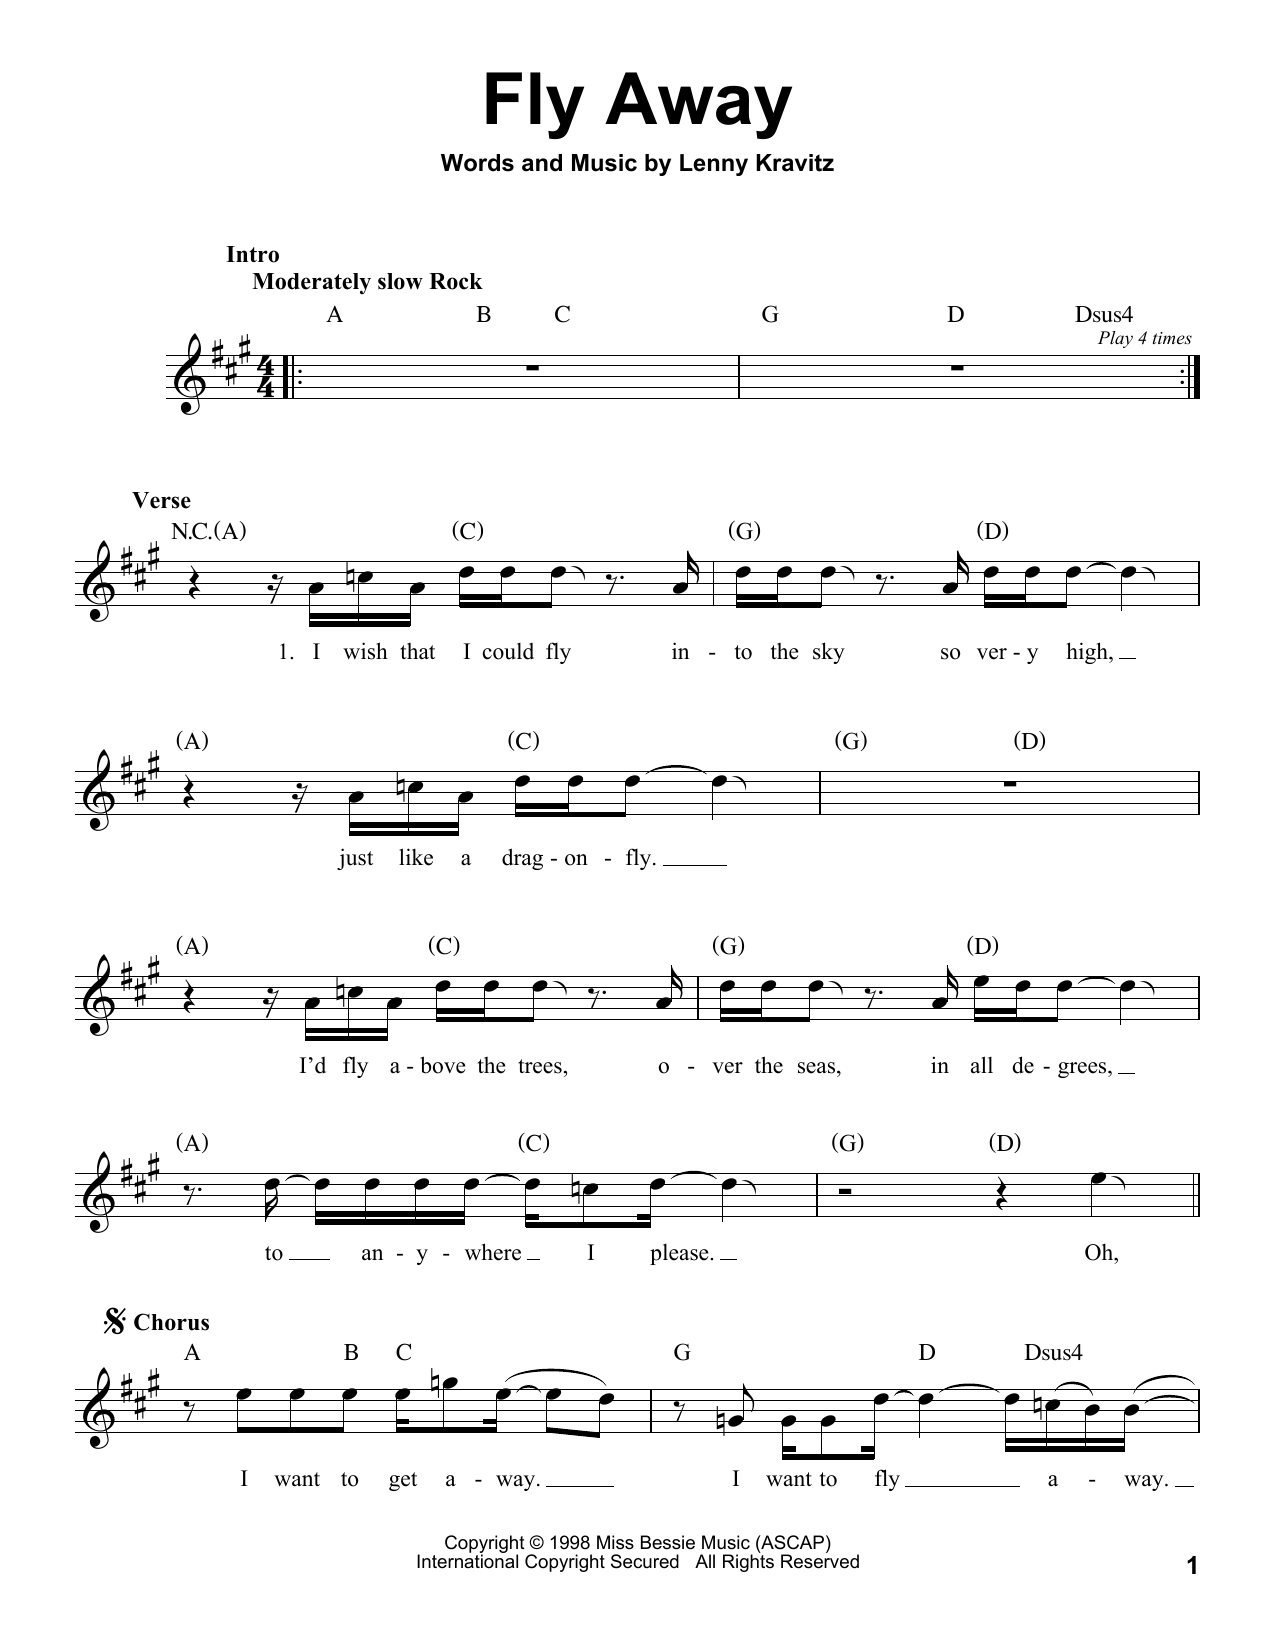 Lenny Kravitz Fly Away Sheet Music Notes Chords Printable Rock